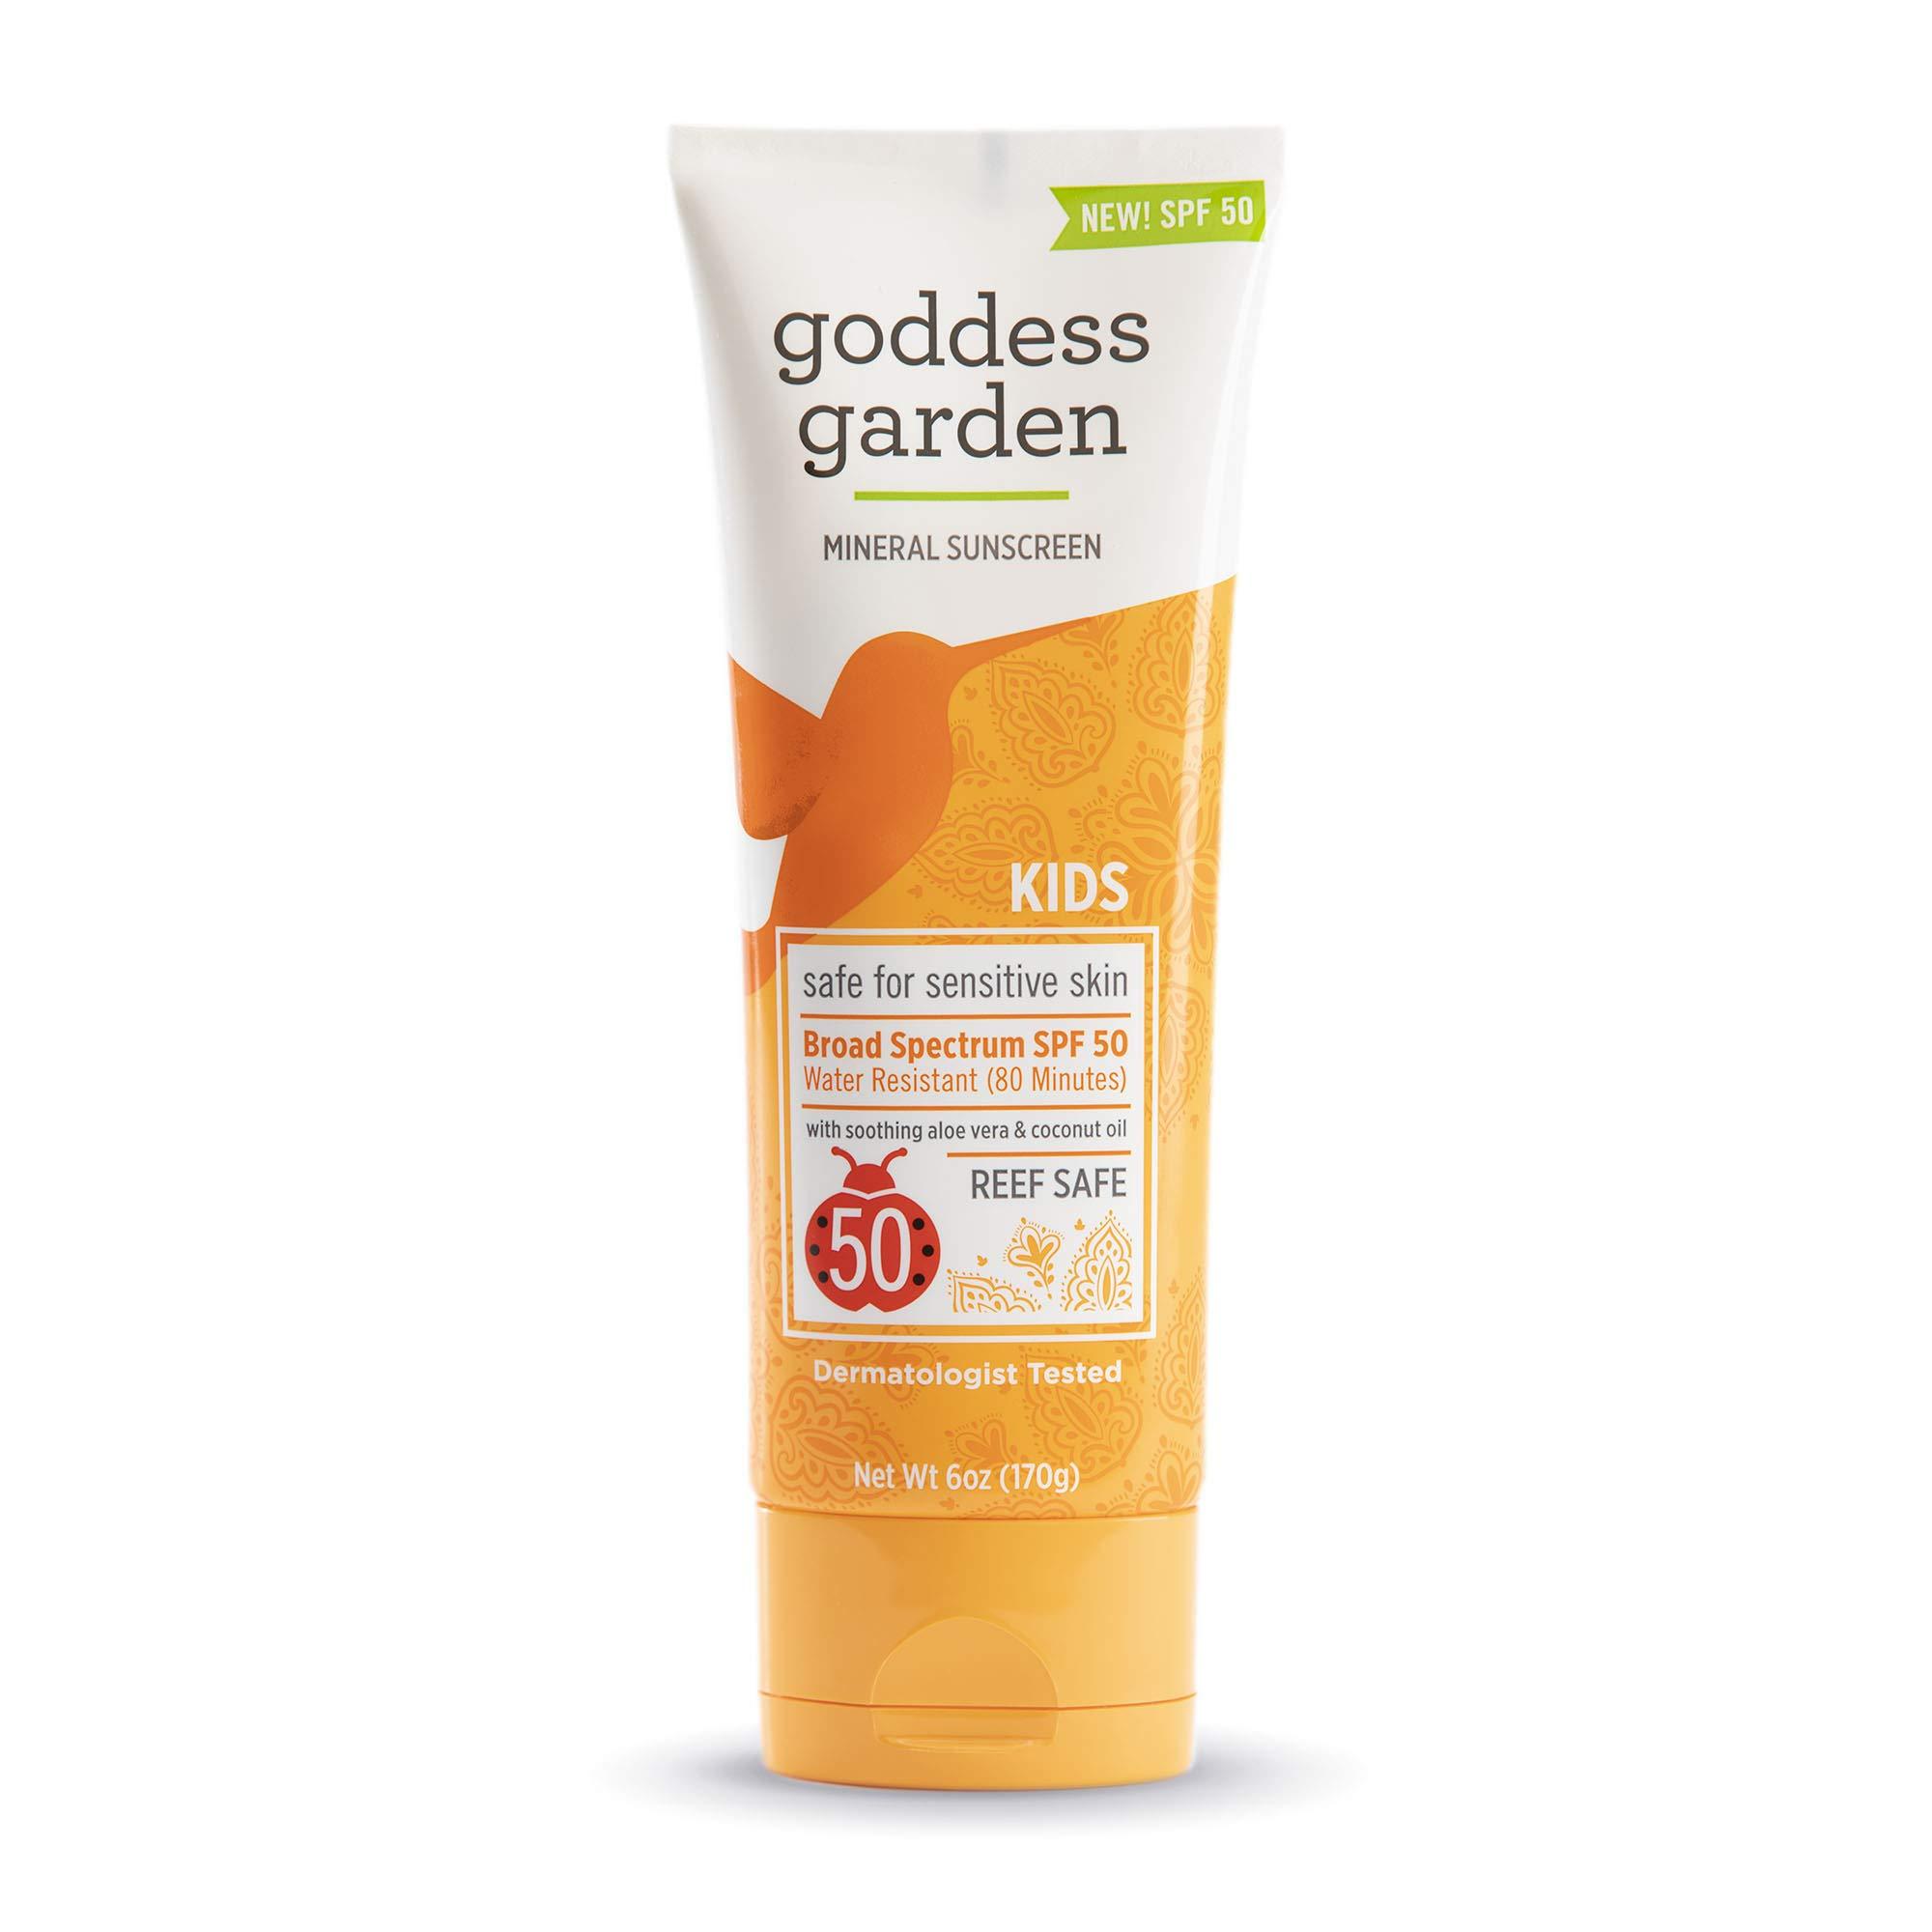 Goddess Garden Kids SPF 50 Mineral Sunscreen Lotion for Sensitive Skin (Tube), Reef Safe, Sheer Zinc Oxide, Broad Spectrum, Water Resistant, Non-Nano, Vegan, Leaping Bunny certified Cruelty-Free, 6oz.